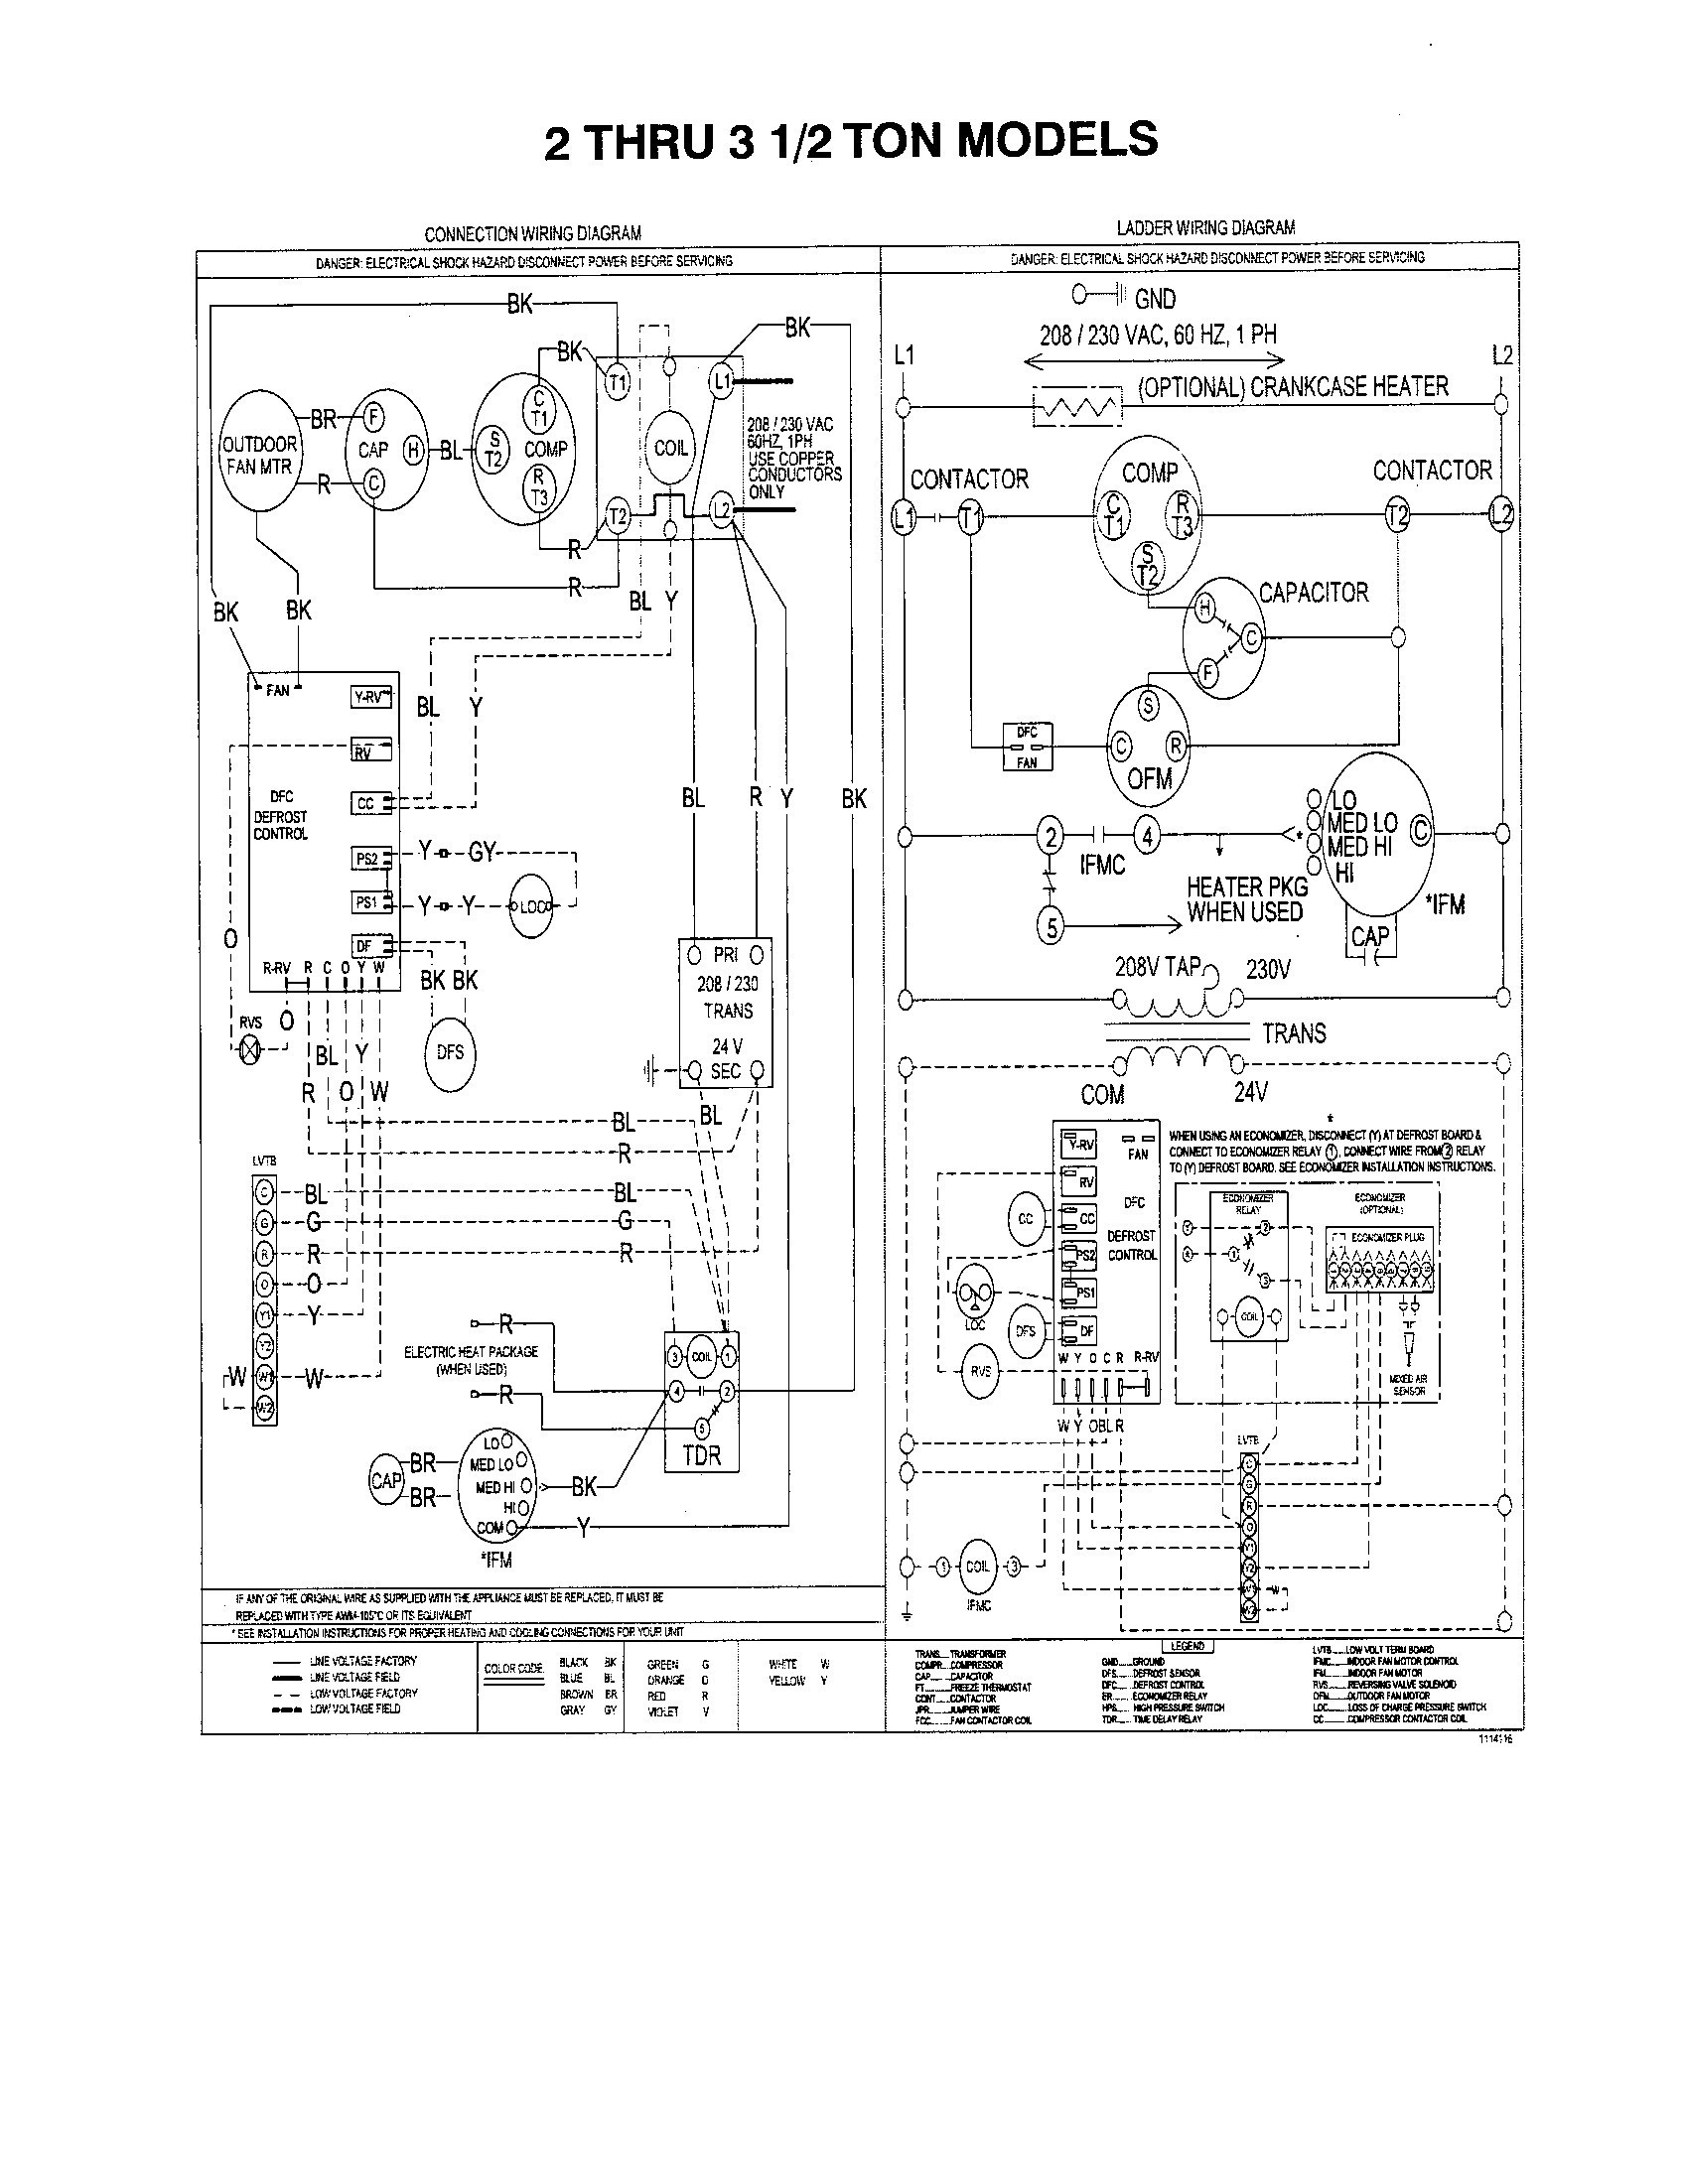 rtu wiring diagrams wiring diagram rh c50 mikroflex de